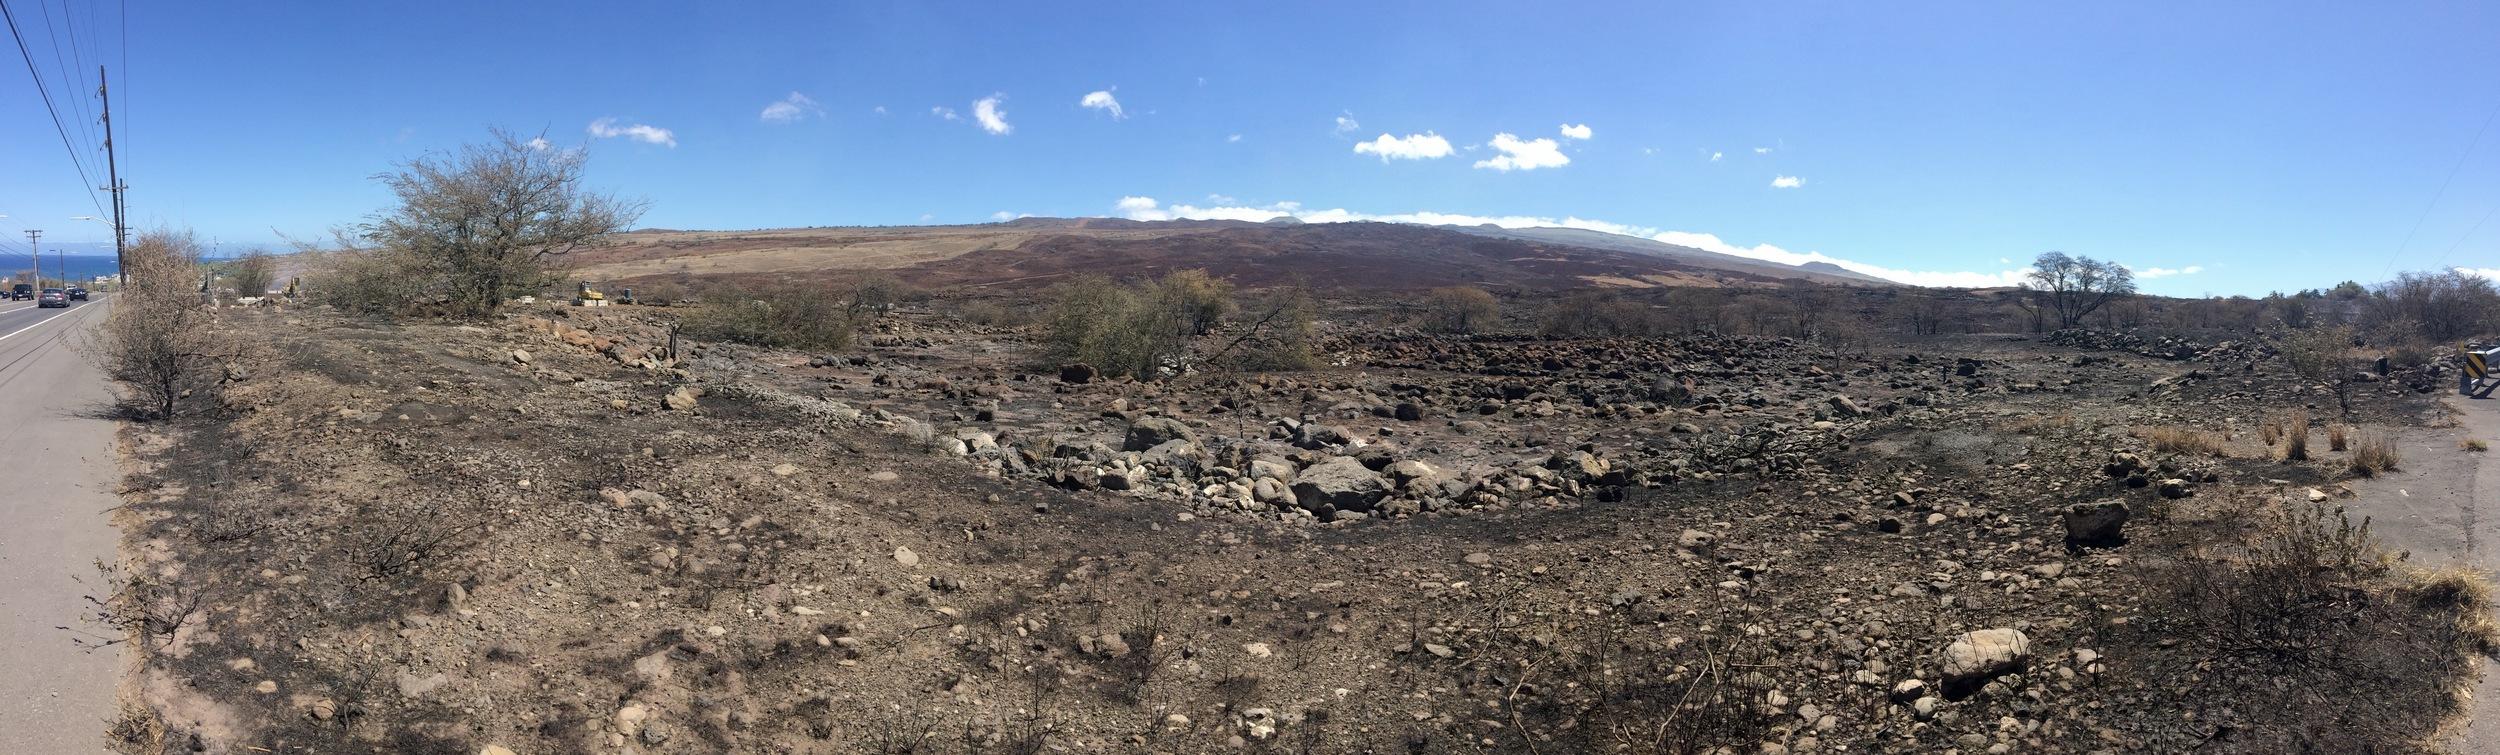 Aftermath of Kawaihae fire that burned from makai to mauka. (Pablo Beimler/HWMO)